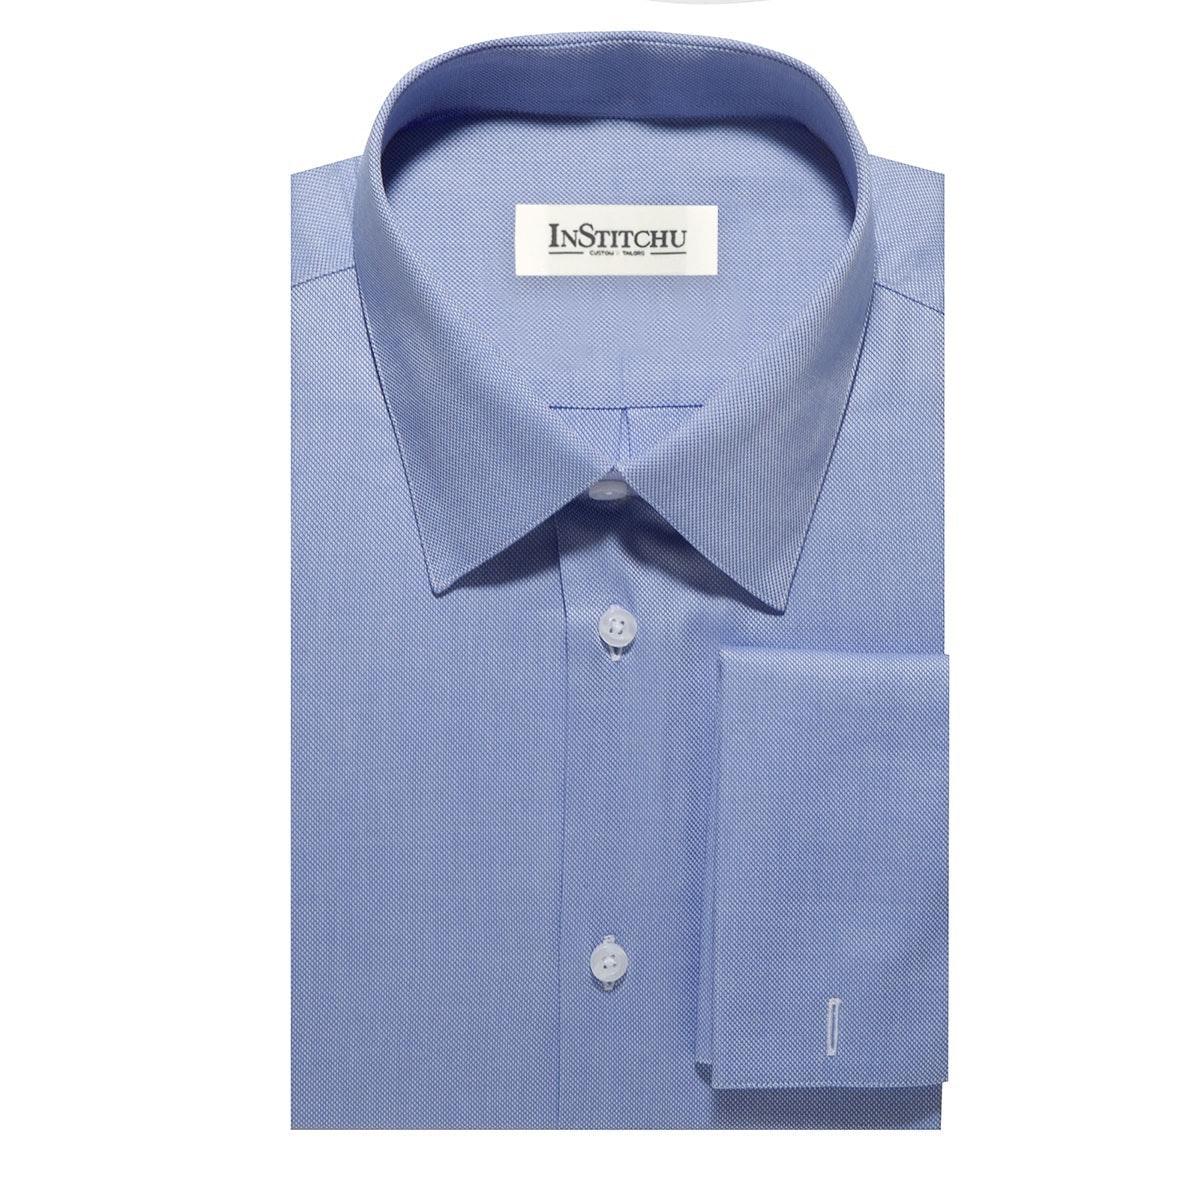 InStitchu Collection The Duxbury Blue Shirt